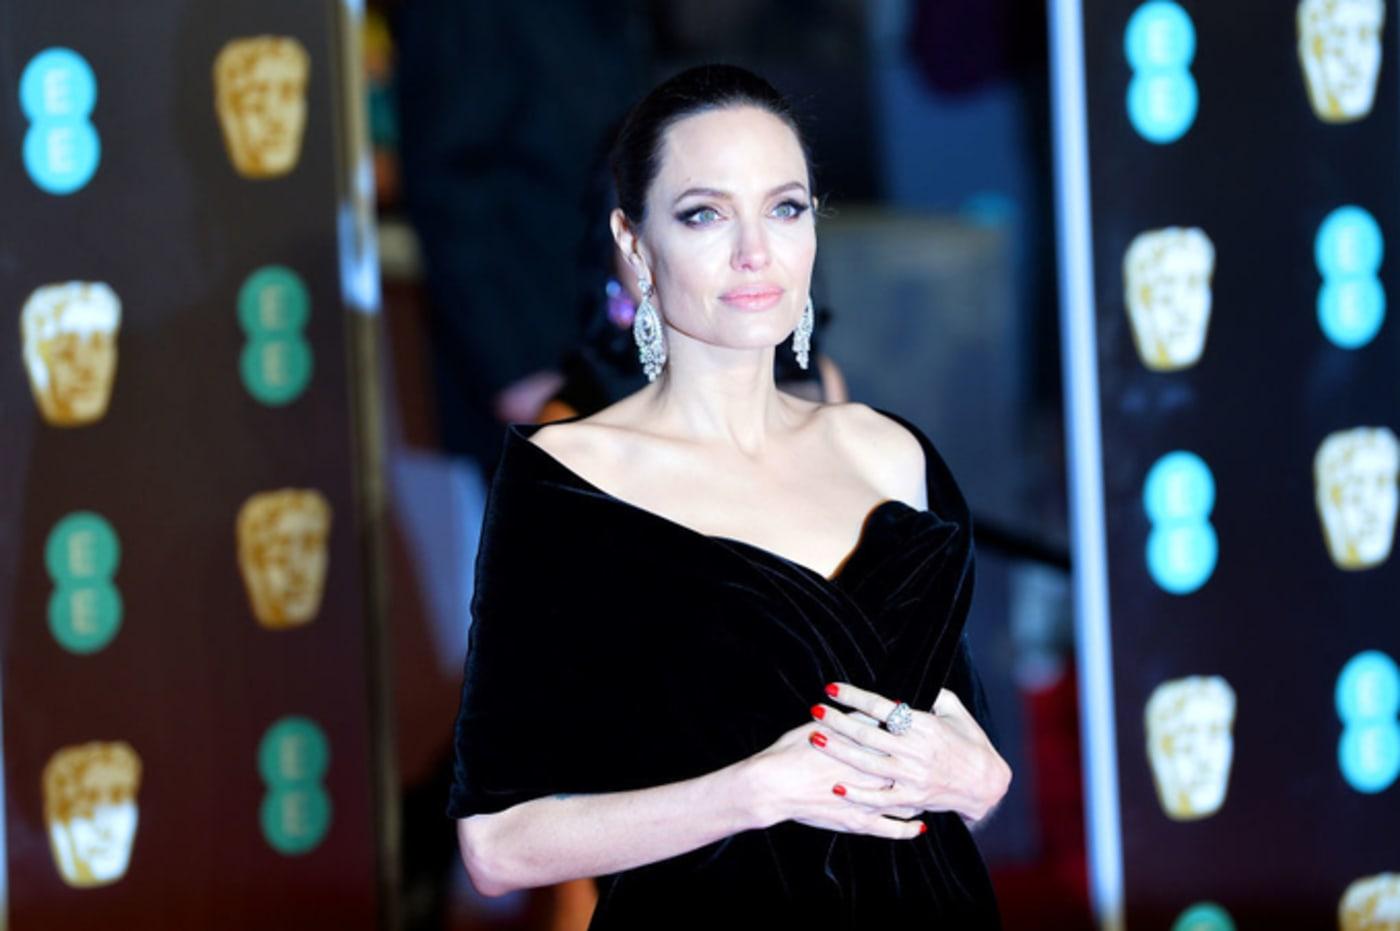 Angelina Jolie attends the EE British Academy Film Awards